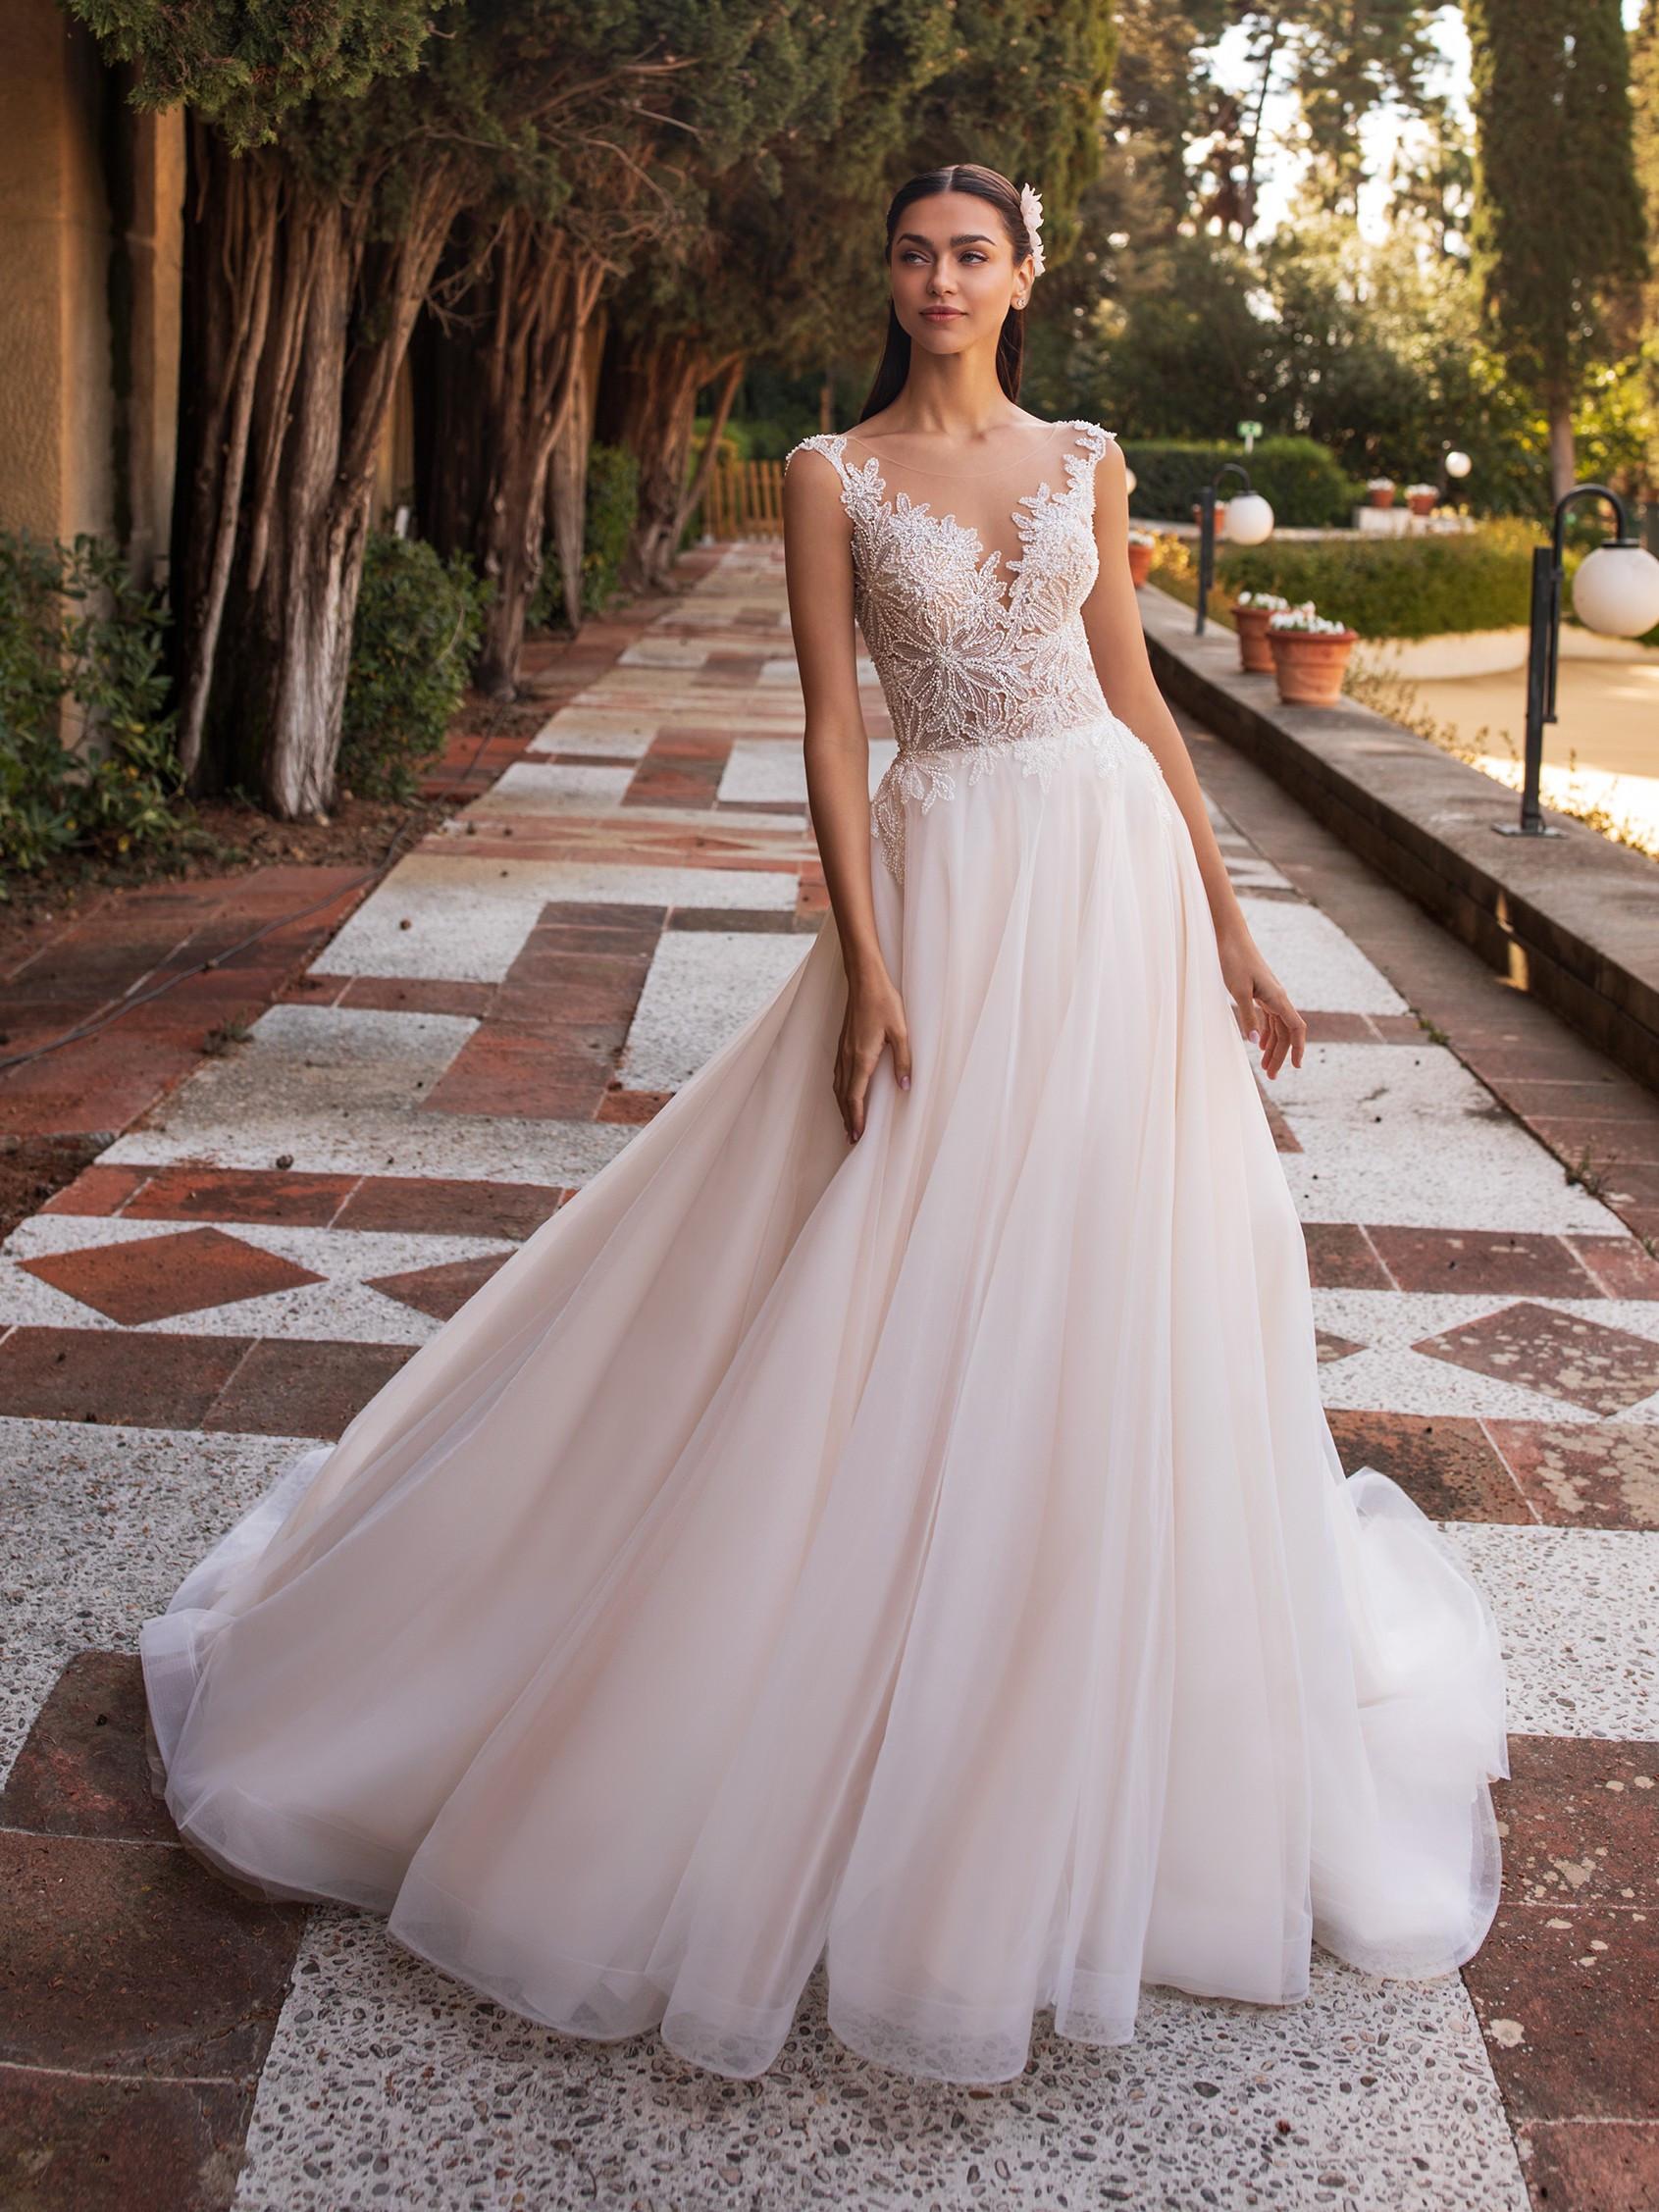 Io menyasszonyi ruha - Pronovias 2021